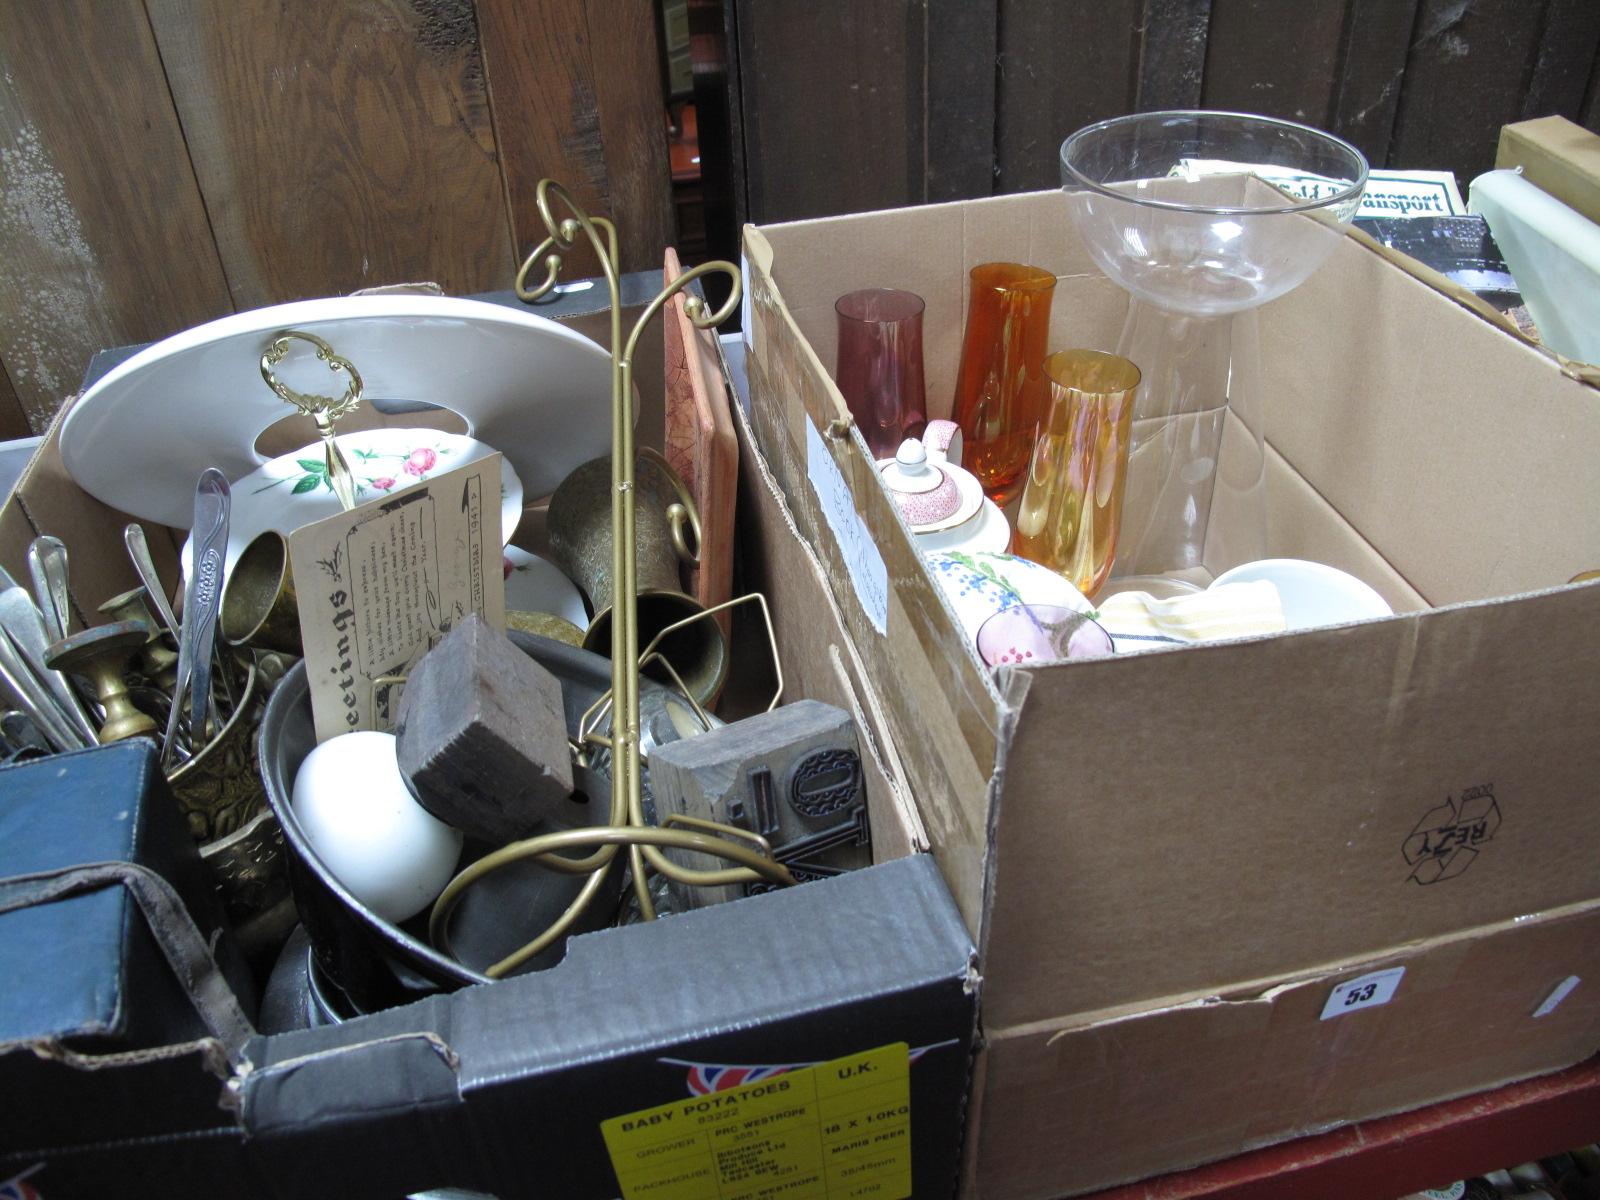 Lot 53 - A Gas Mask, printing blocks, metal wares, Ridgeway pottery, glassware, etc:- Two Boxes